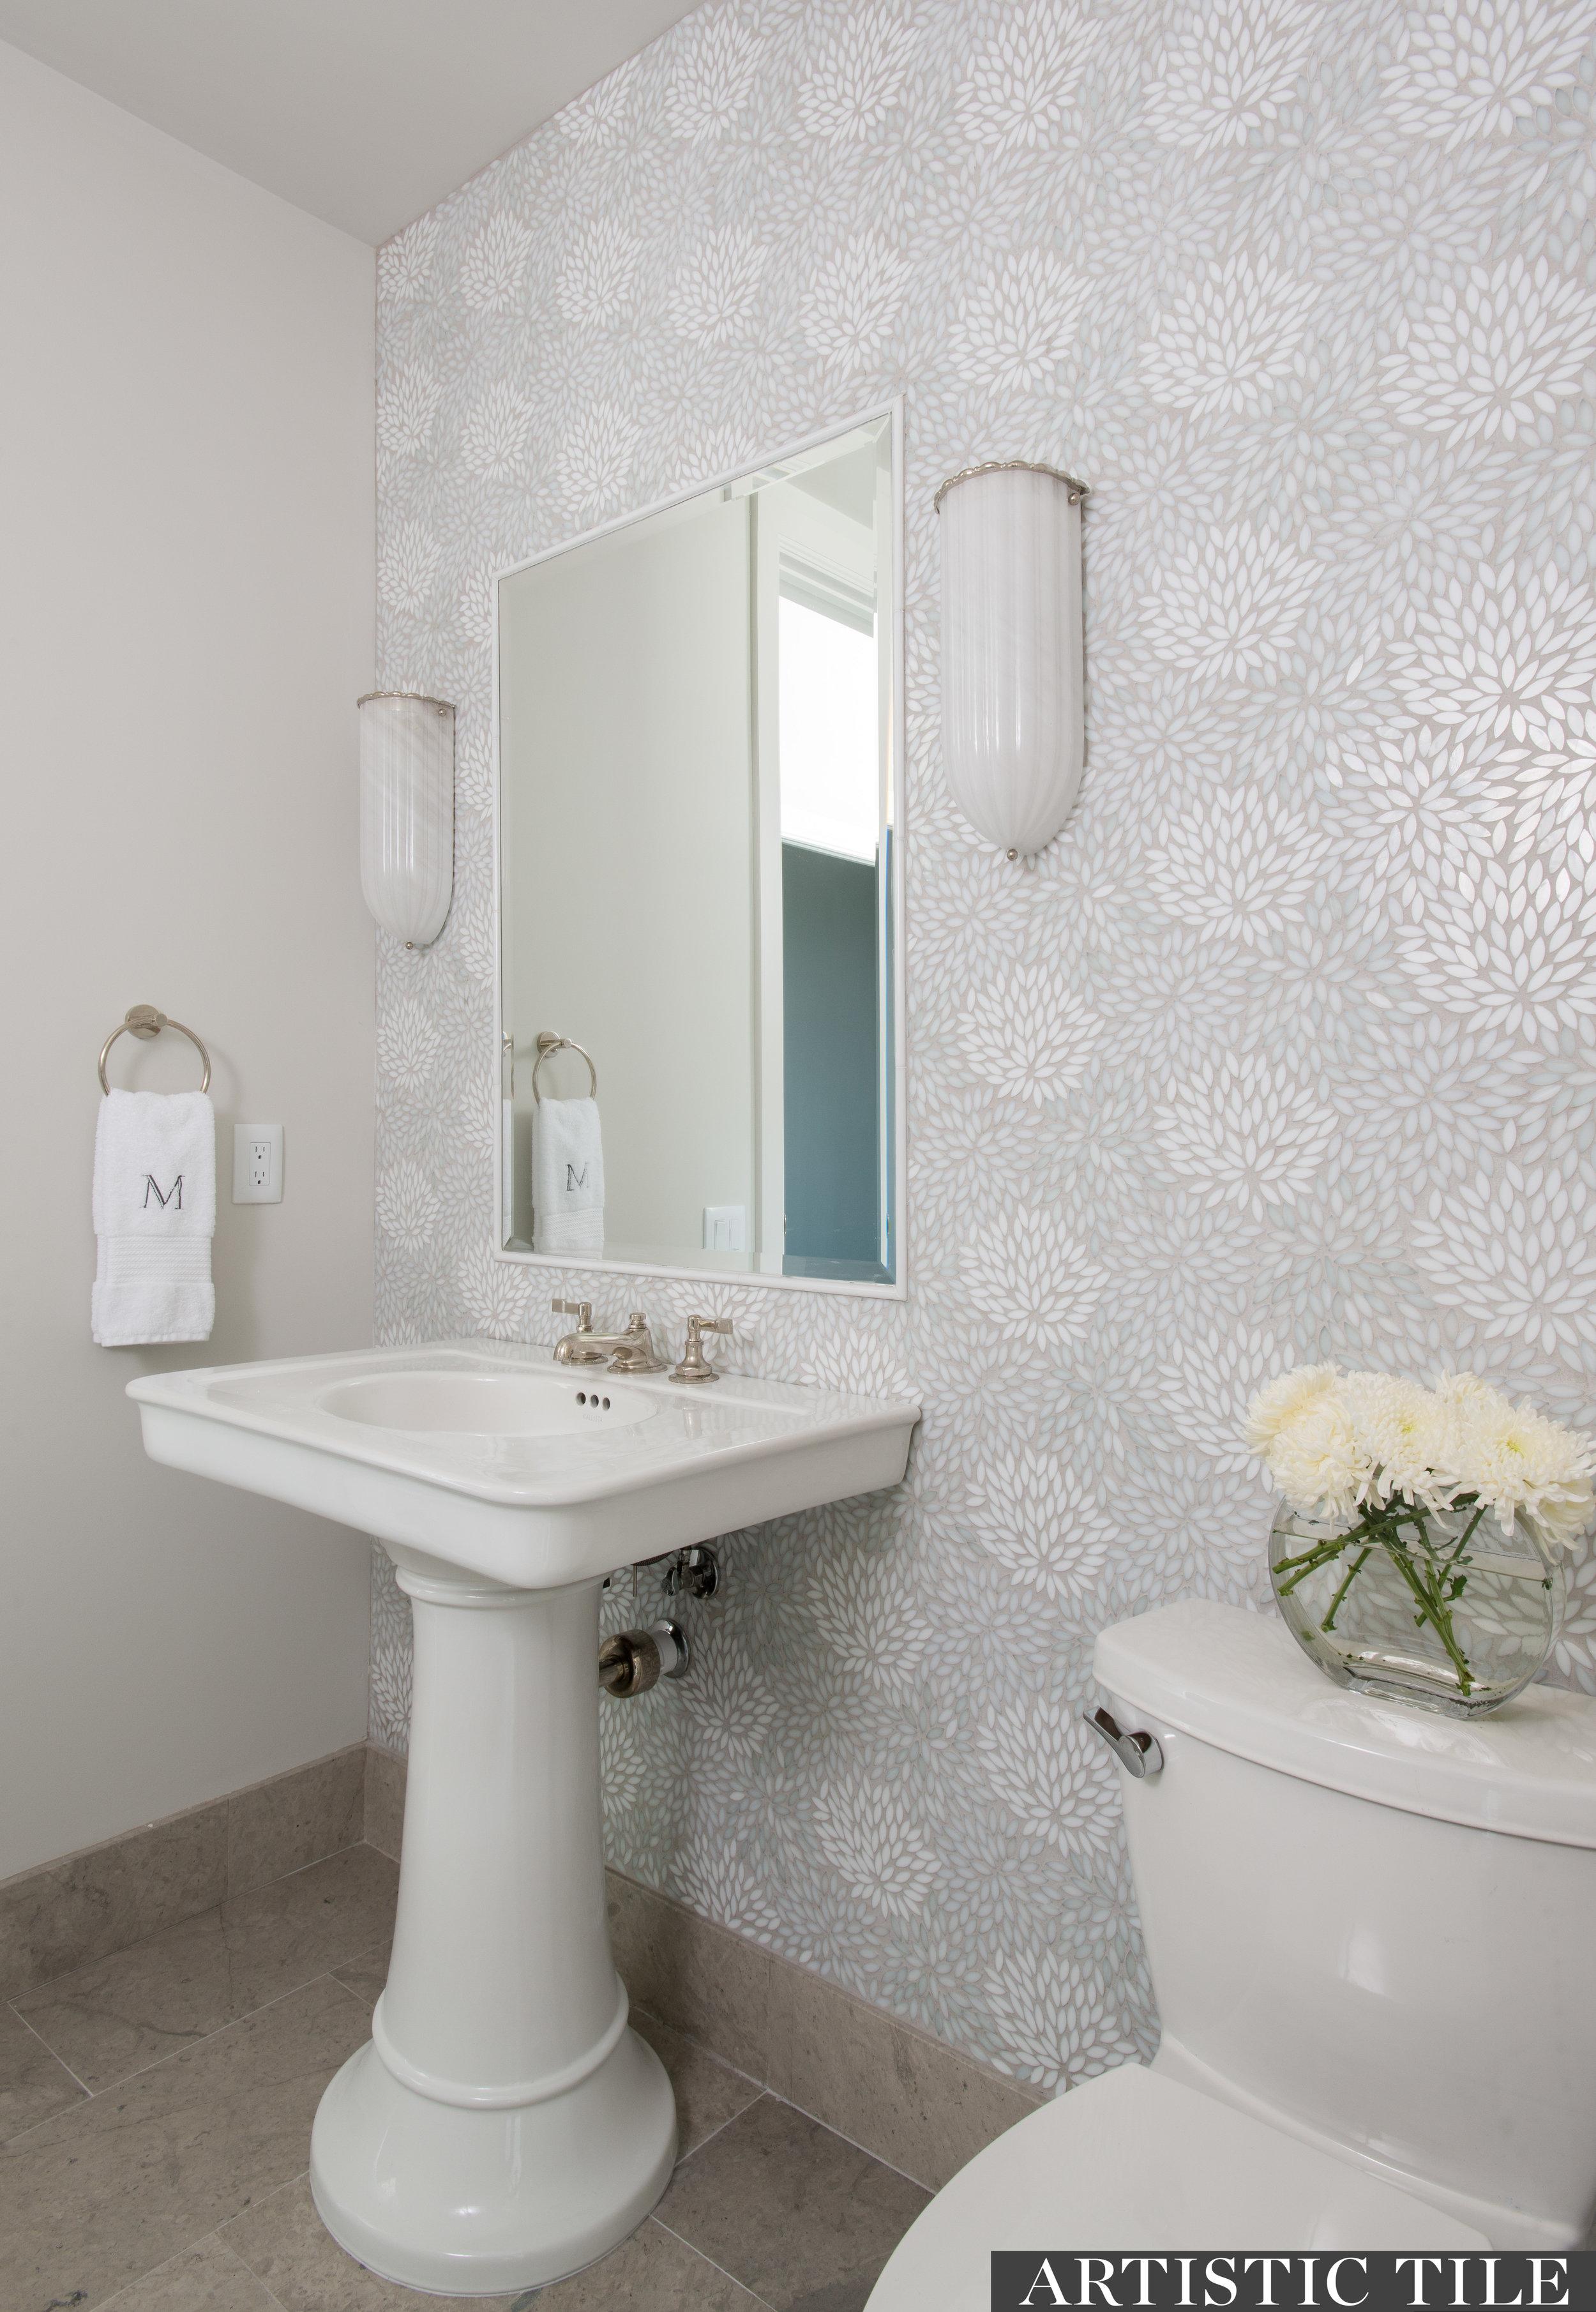 ART - Artistic -Estrella Be Bop White - Mosaic Tile - Bathroom.jpg